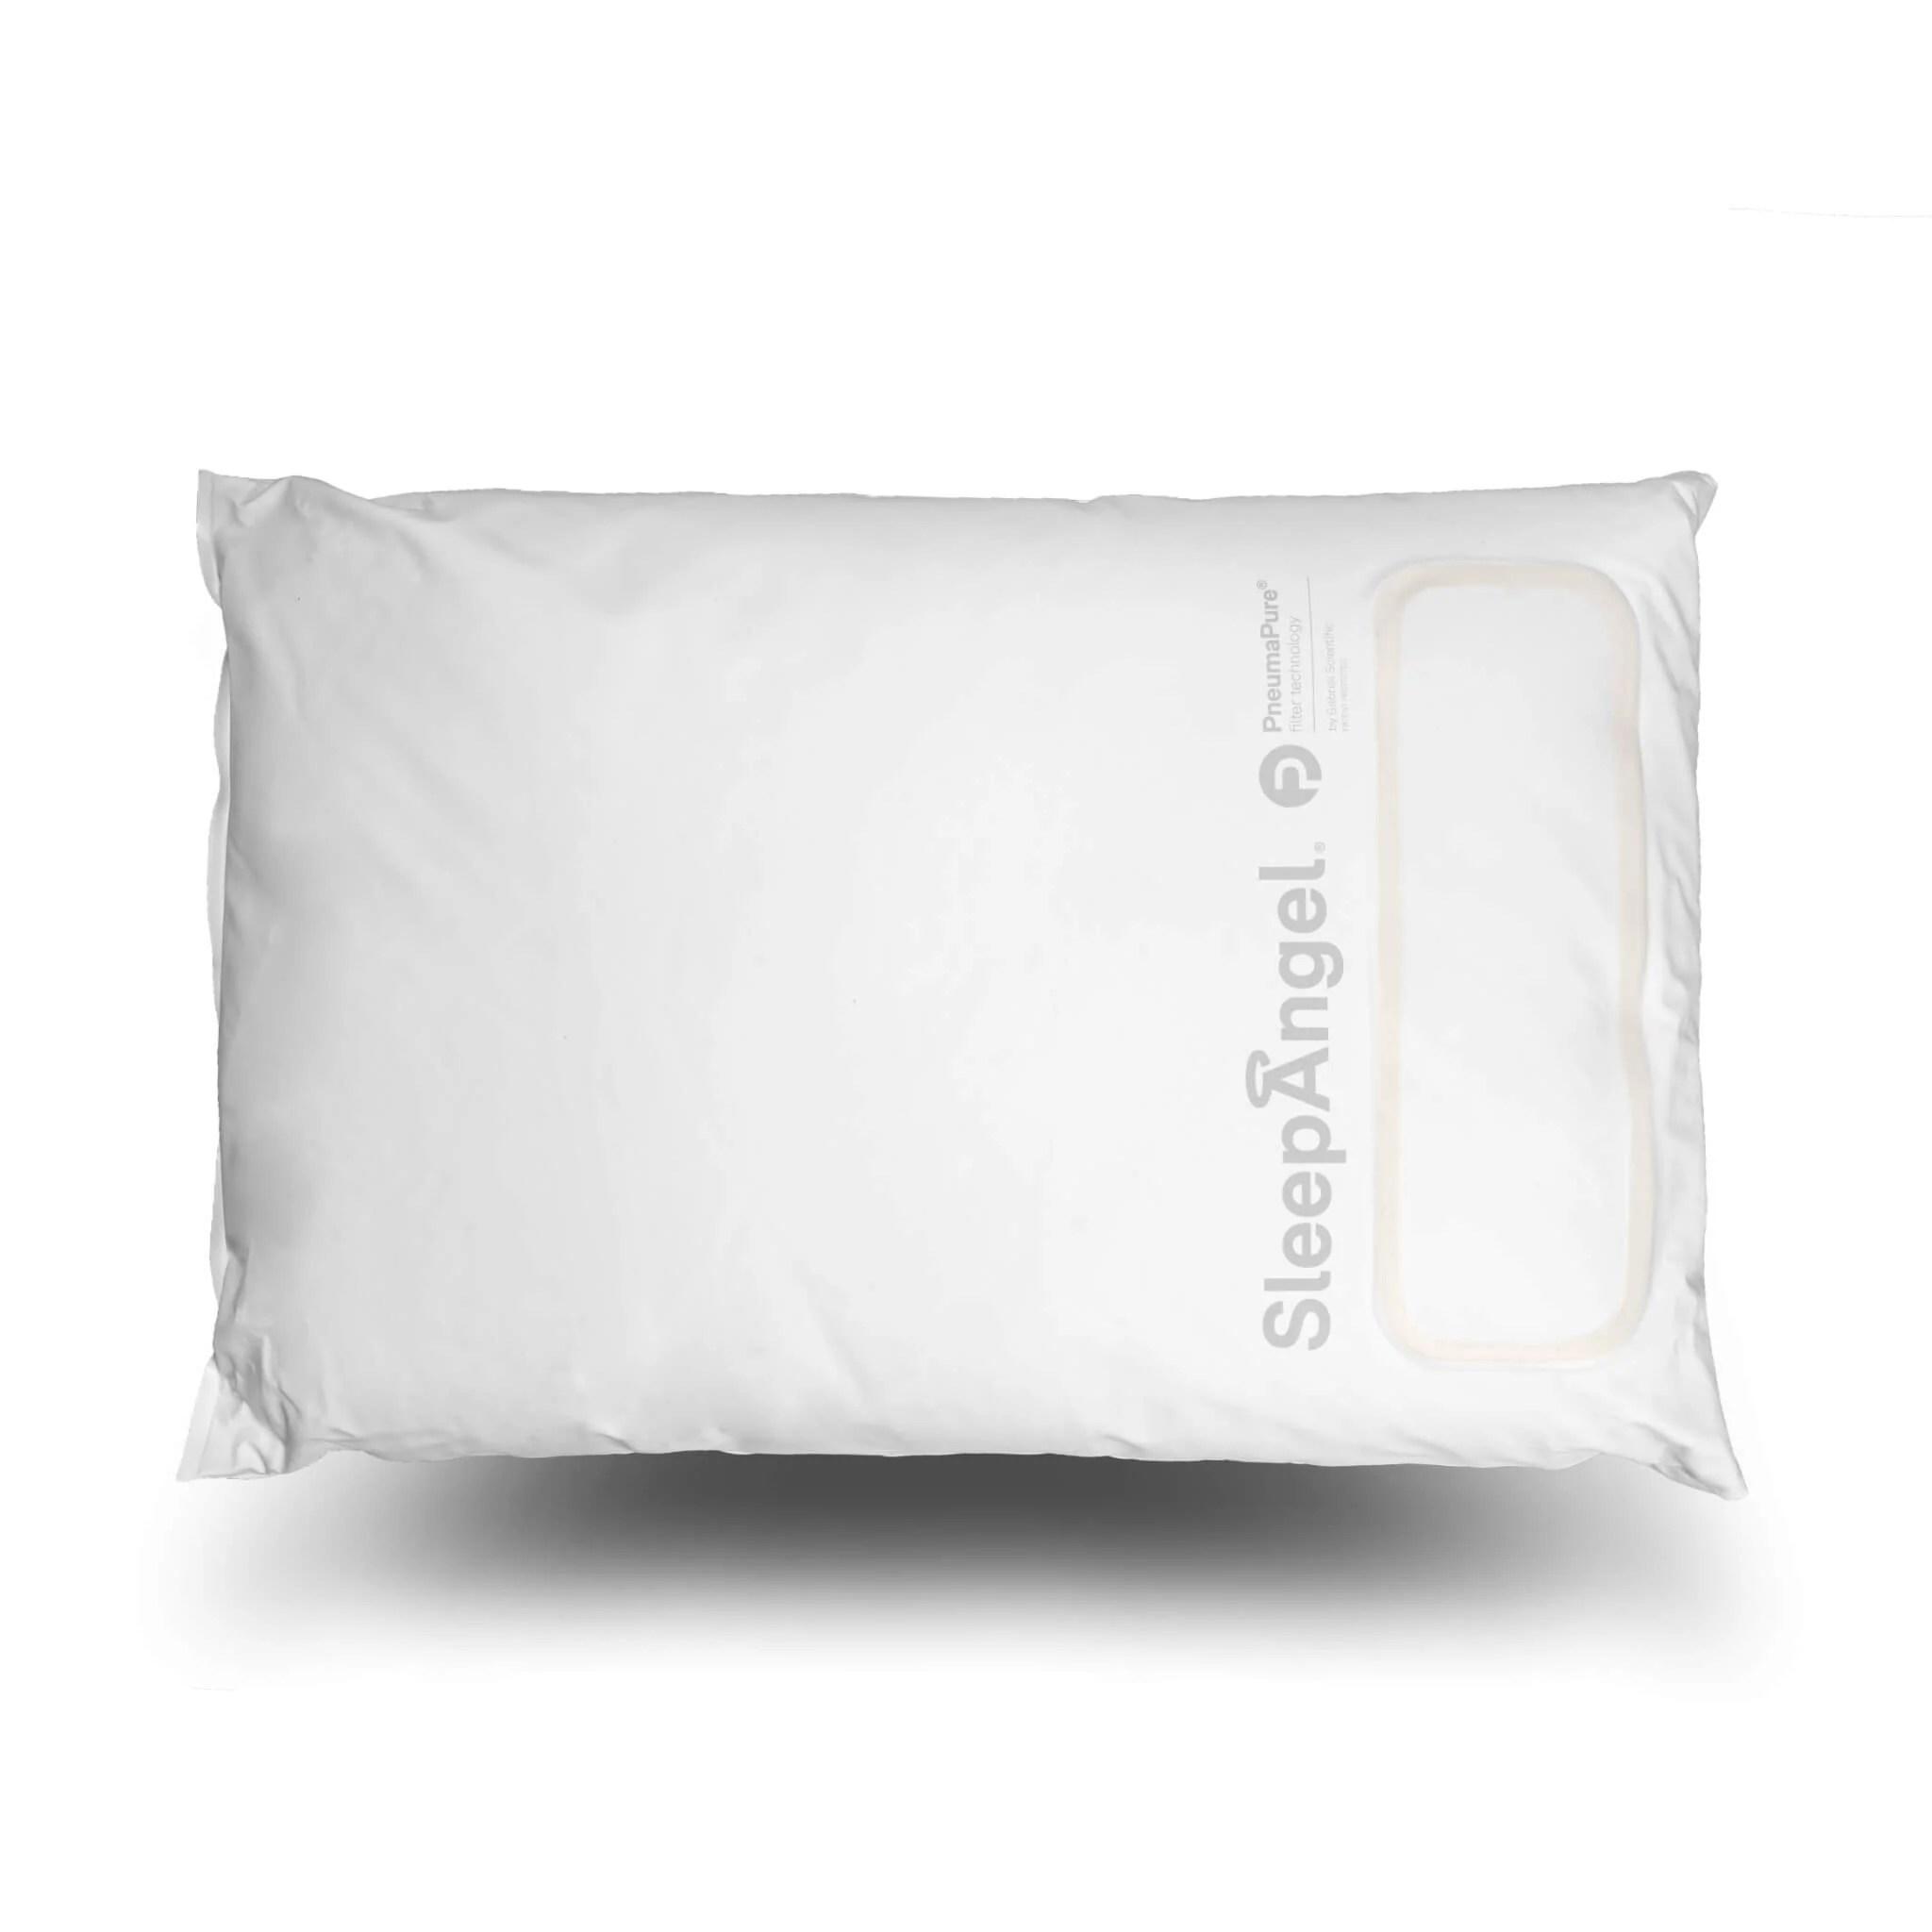 sleepangel microfiber pillow with pneumapure filter antibacterial antiallergic antipathogenic antiviral easy maintenance